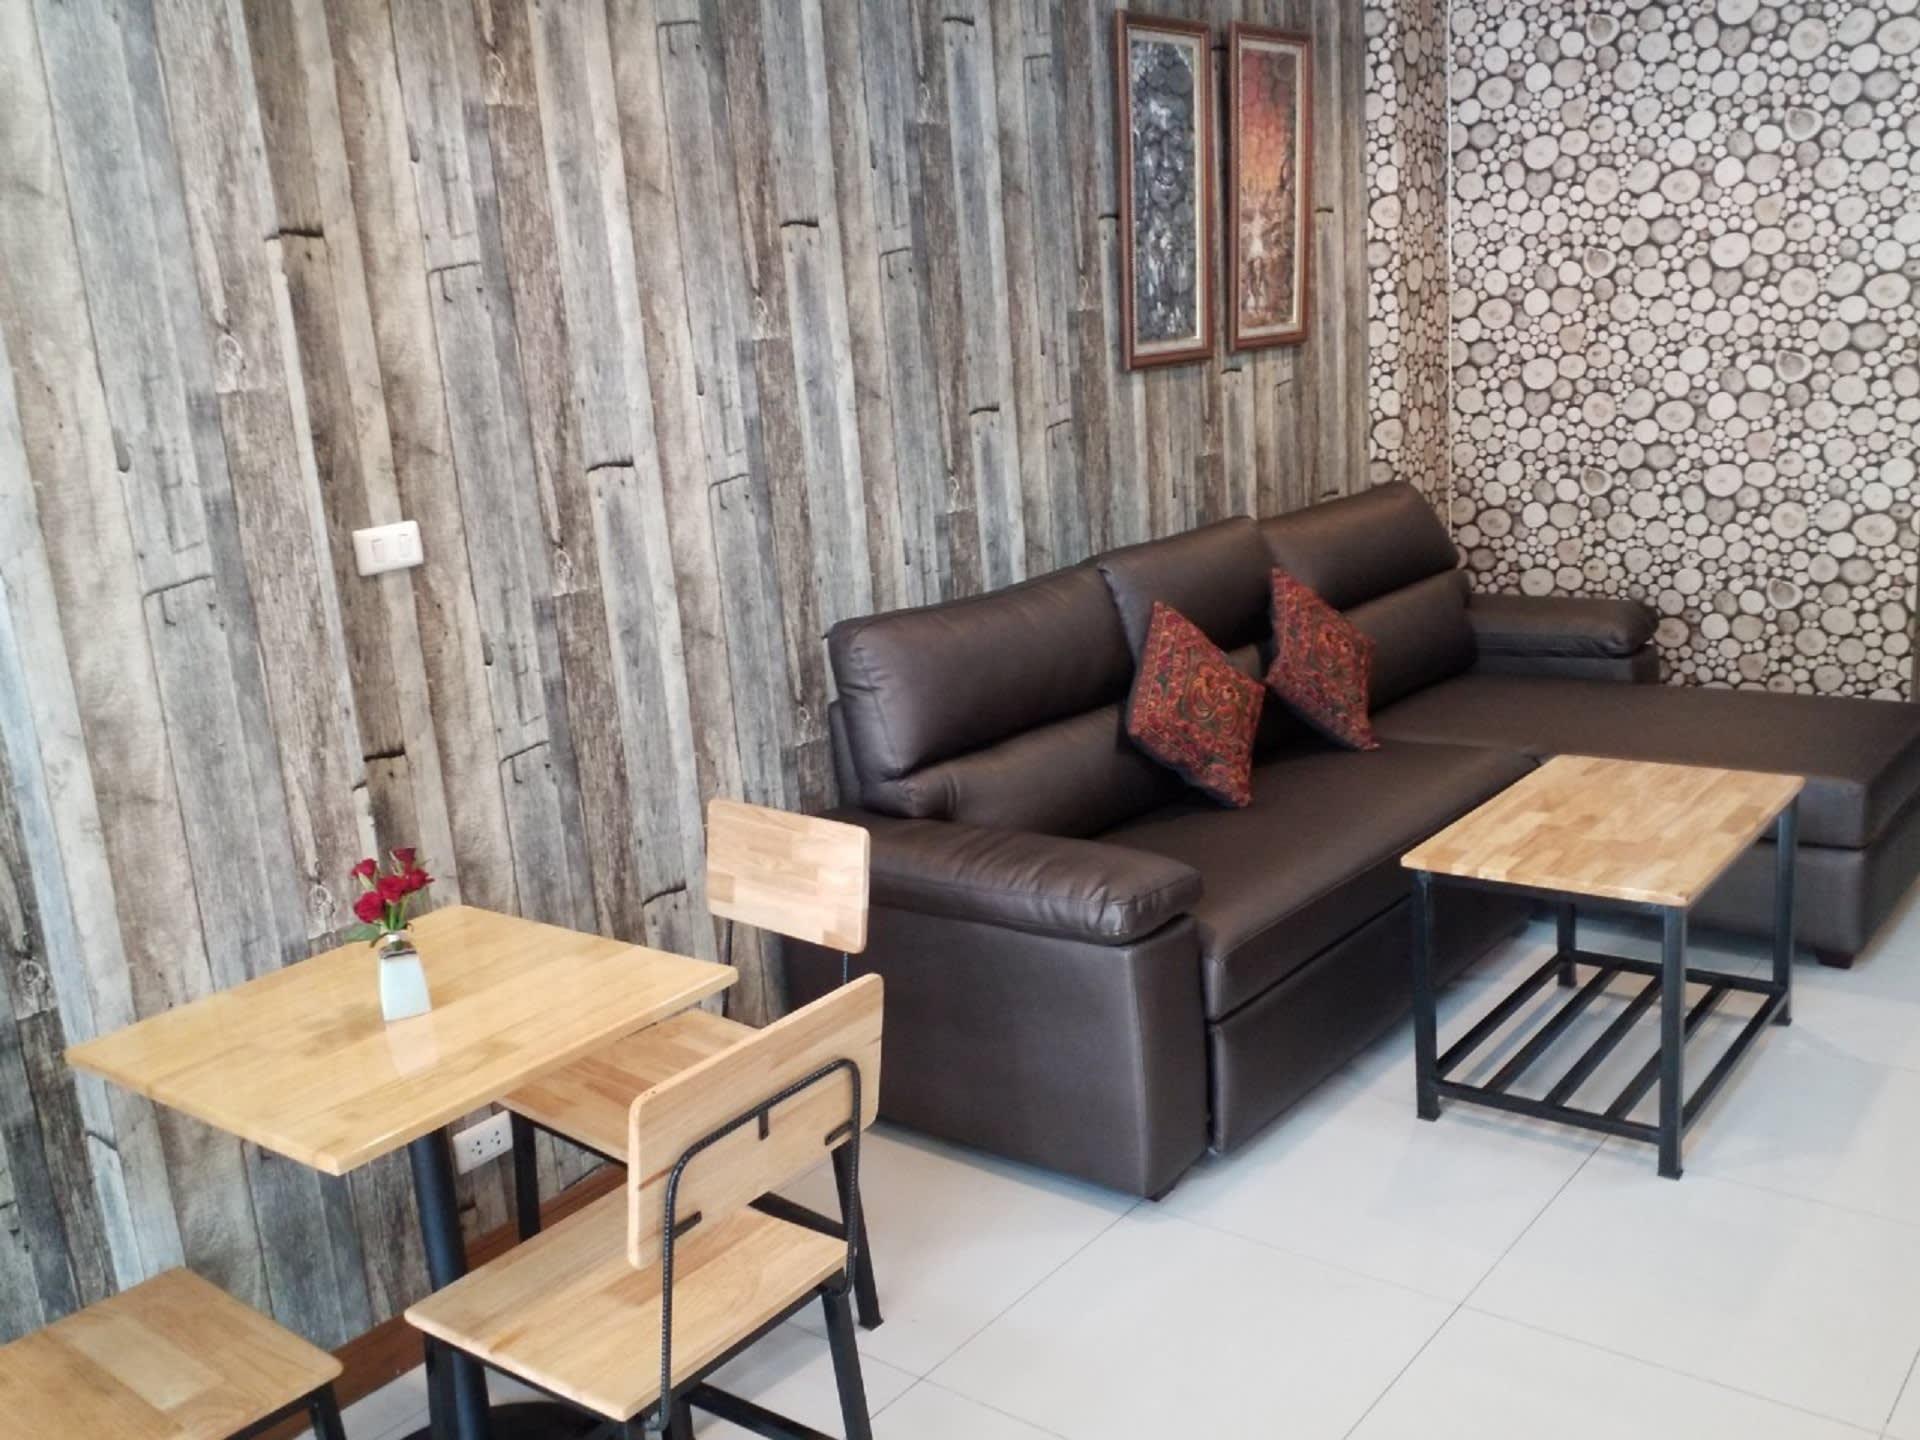 HOSTEL - Toto Hostel Chiangmai